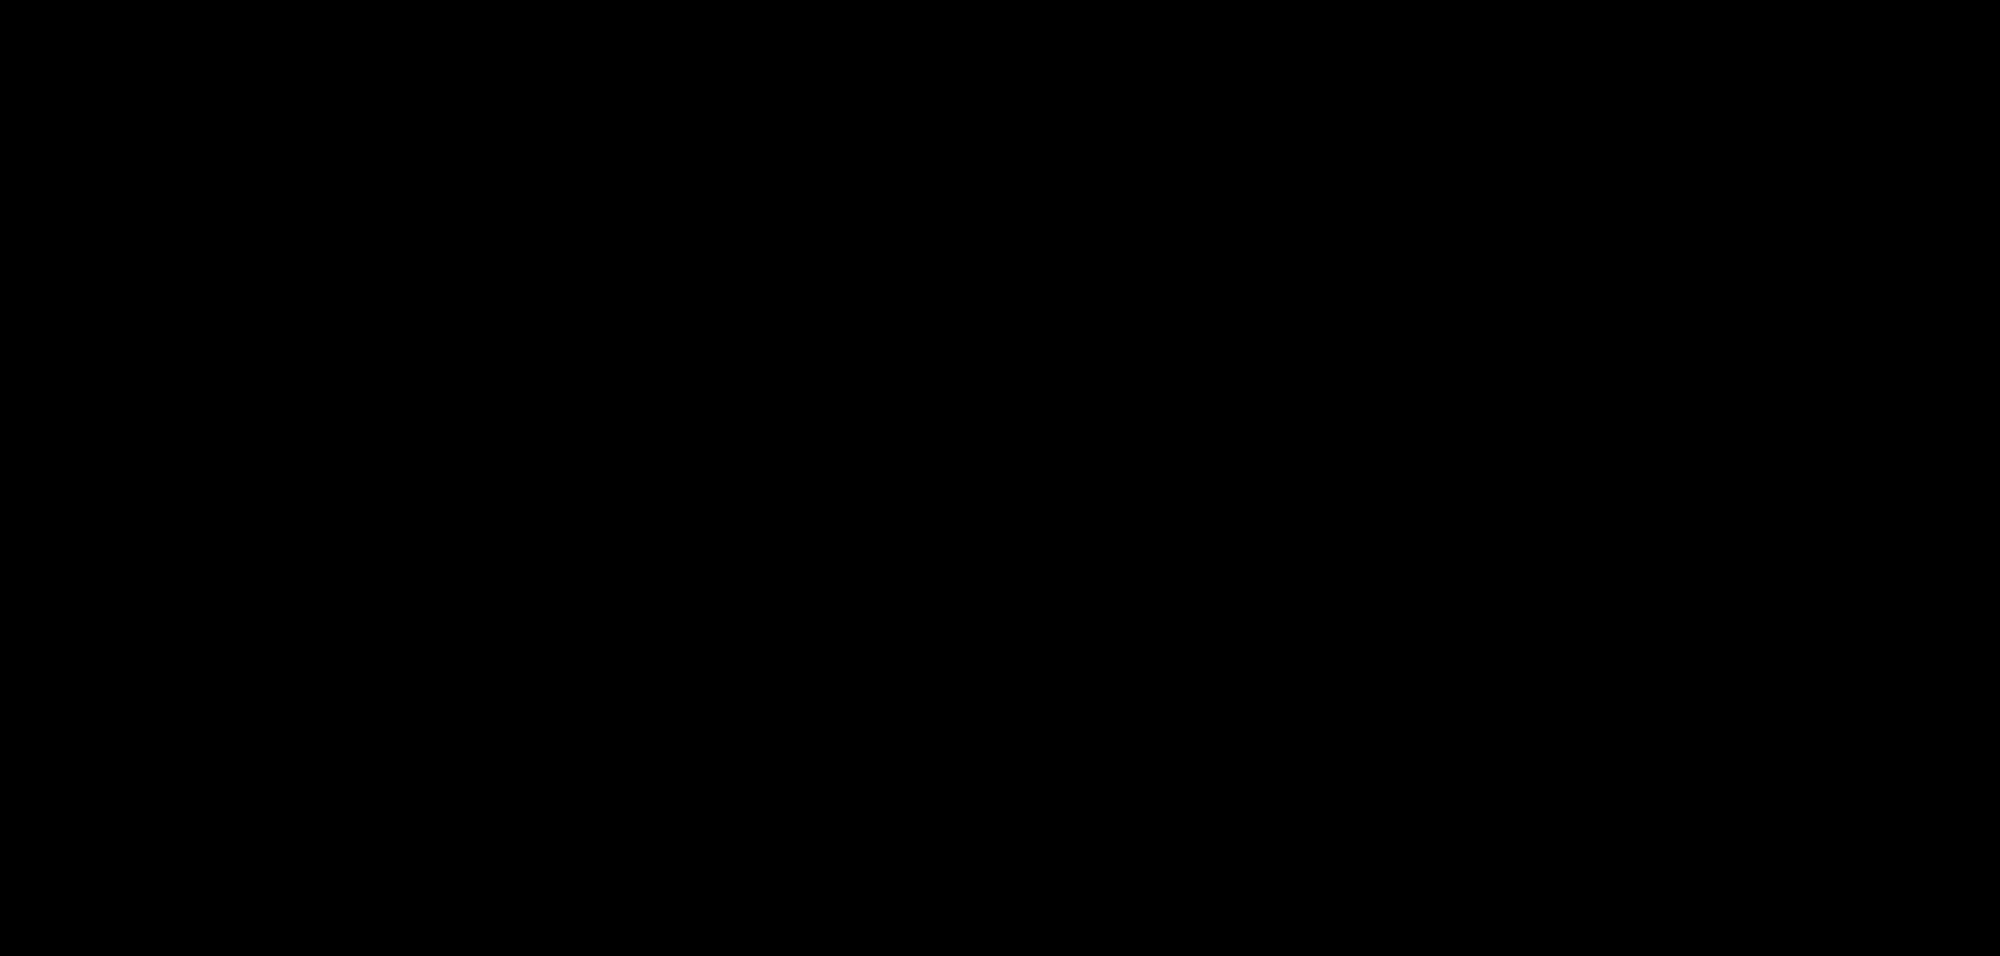 logo-black(1).png